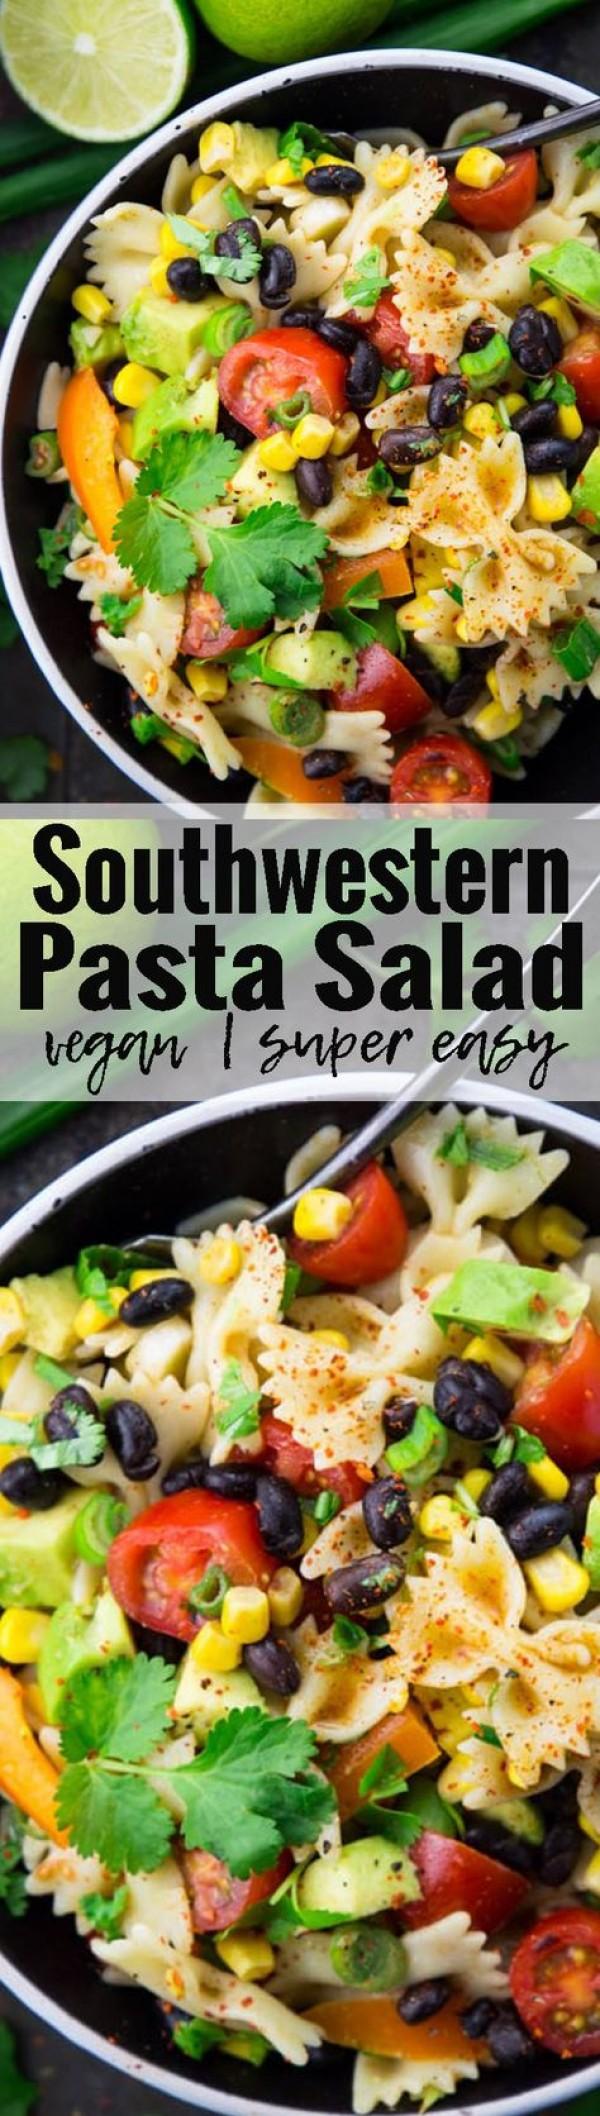 Get the recipe Southwestern Pasta Salad @recipes_to_go